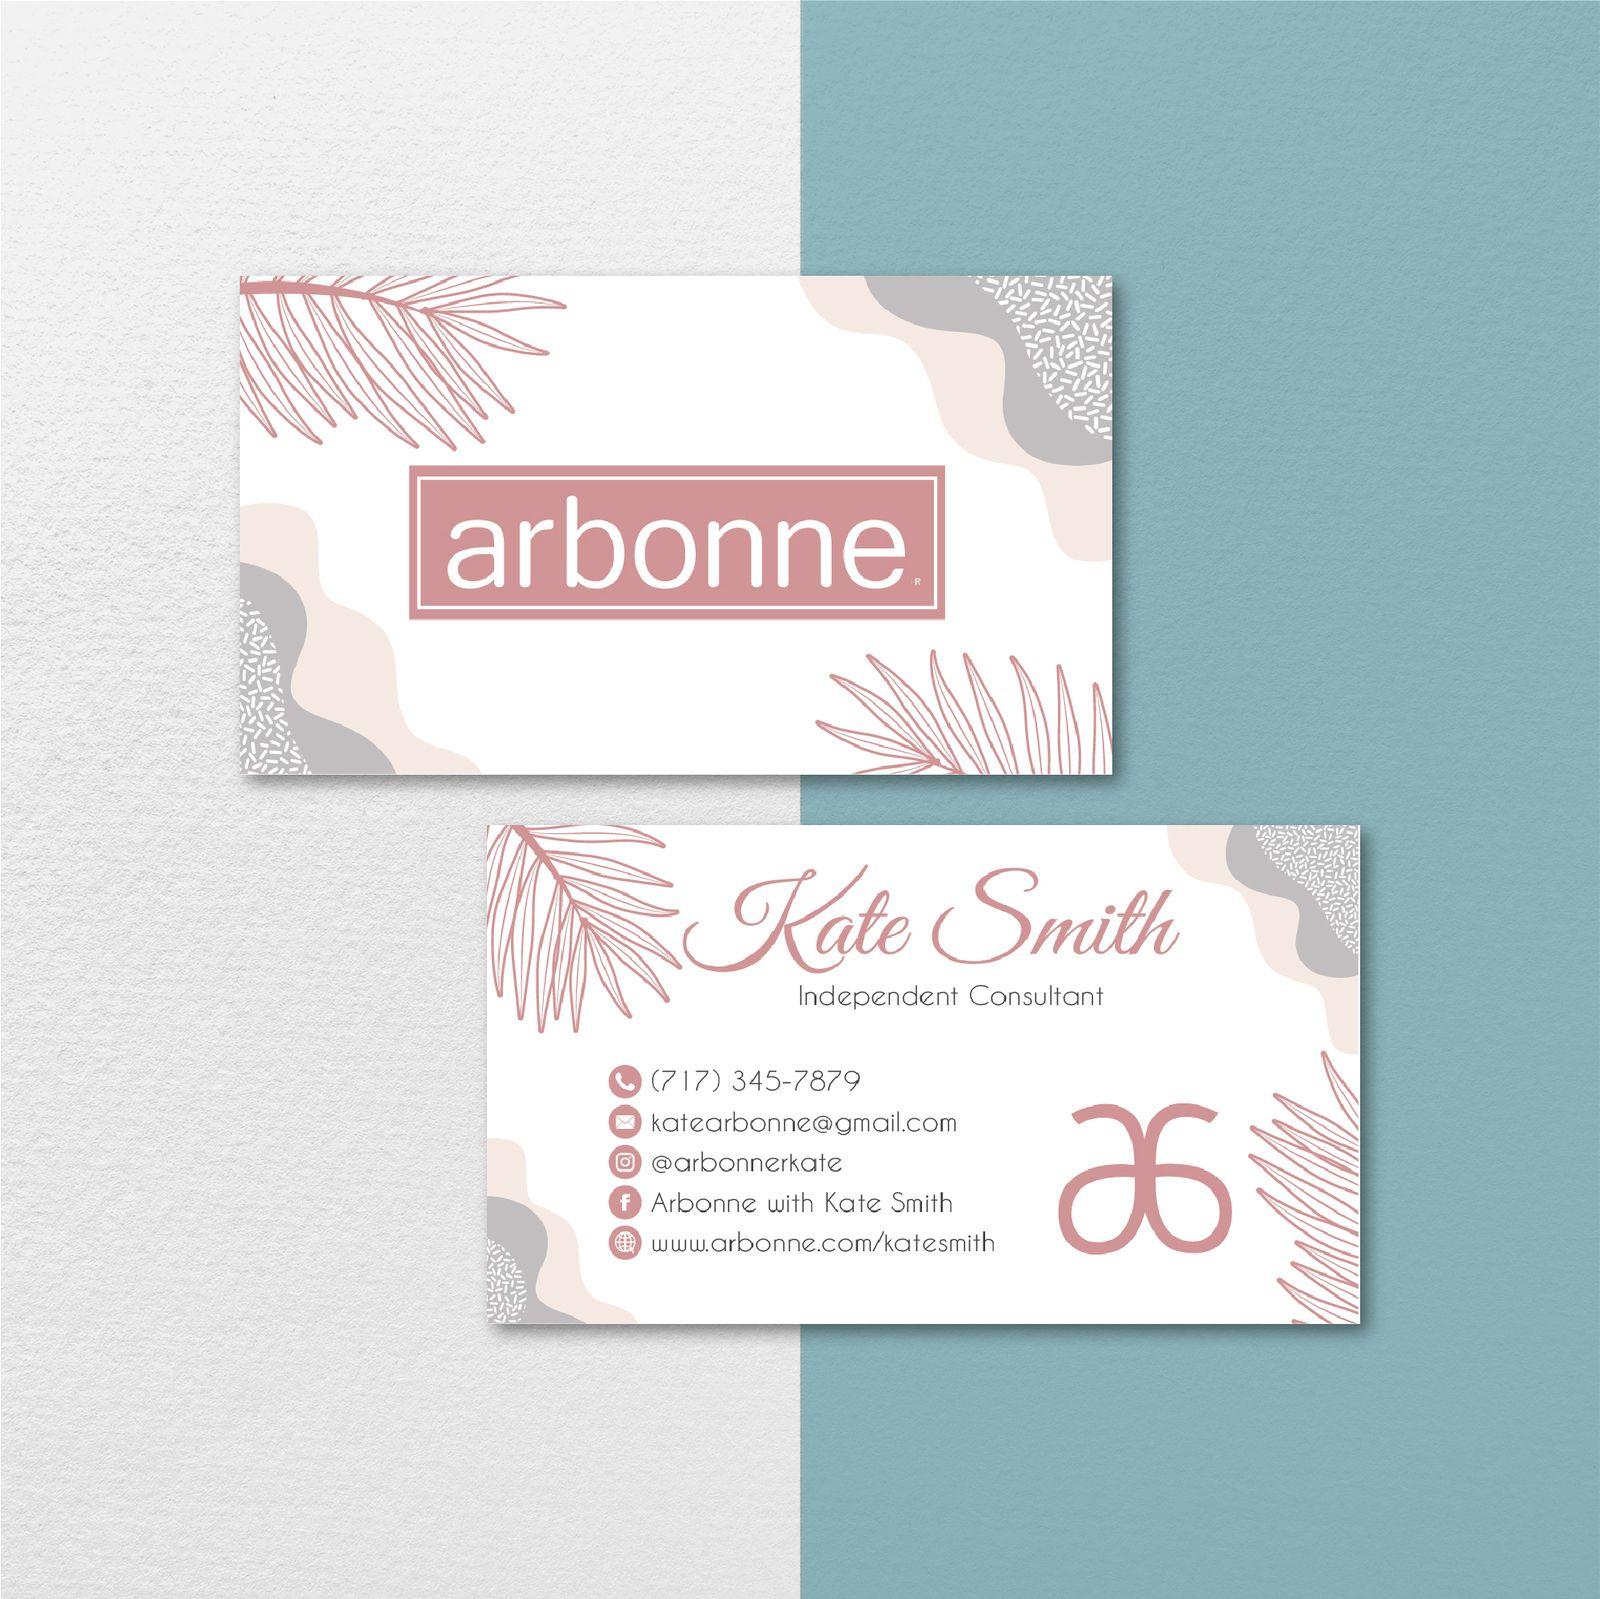 Vintage Personalized Arbonne Business Card Arbonne Business Cards Ab131 Business Cards Arbonne Business Cards Arbonne Business Cards